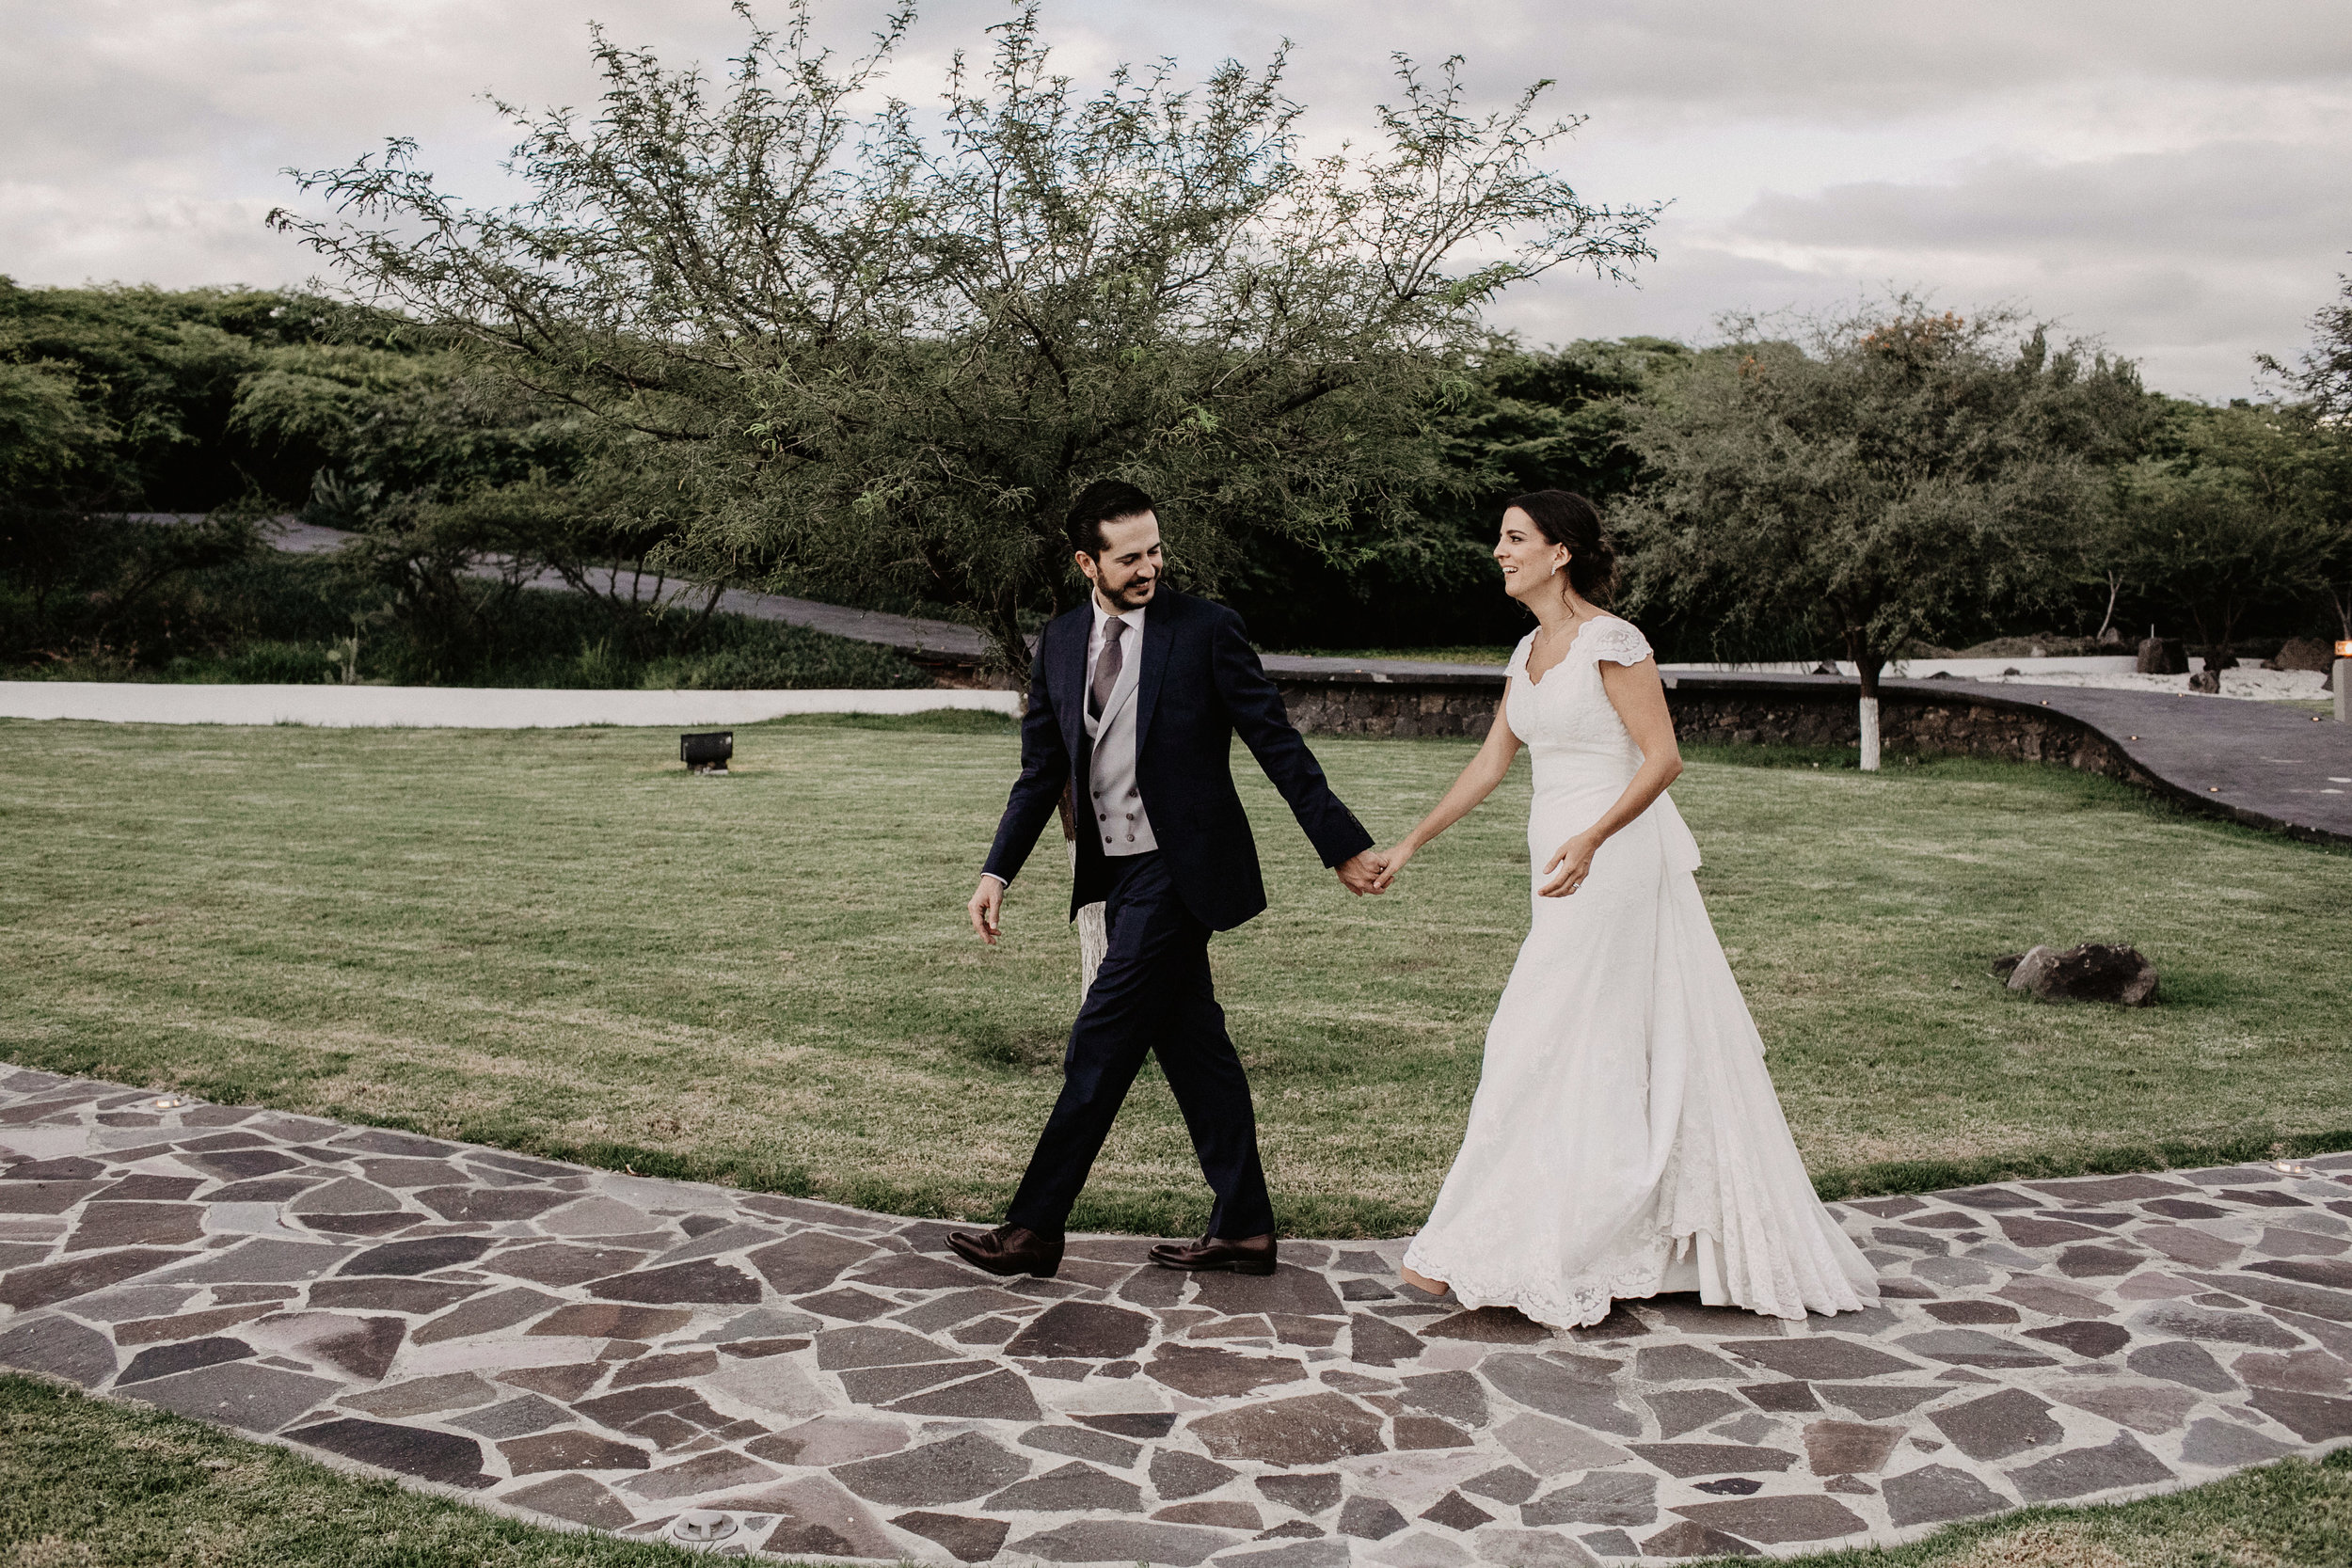 alfonso_flores_destination_wedding_photographer_pau_alonso_1017.JPG